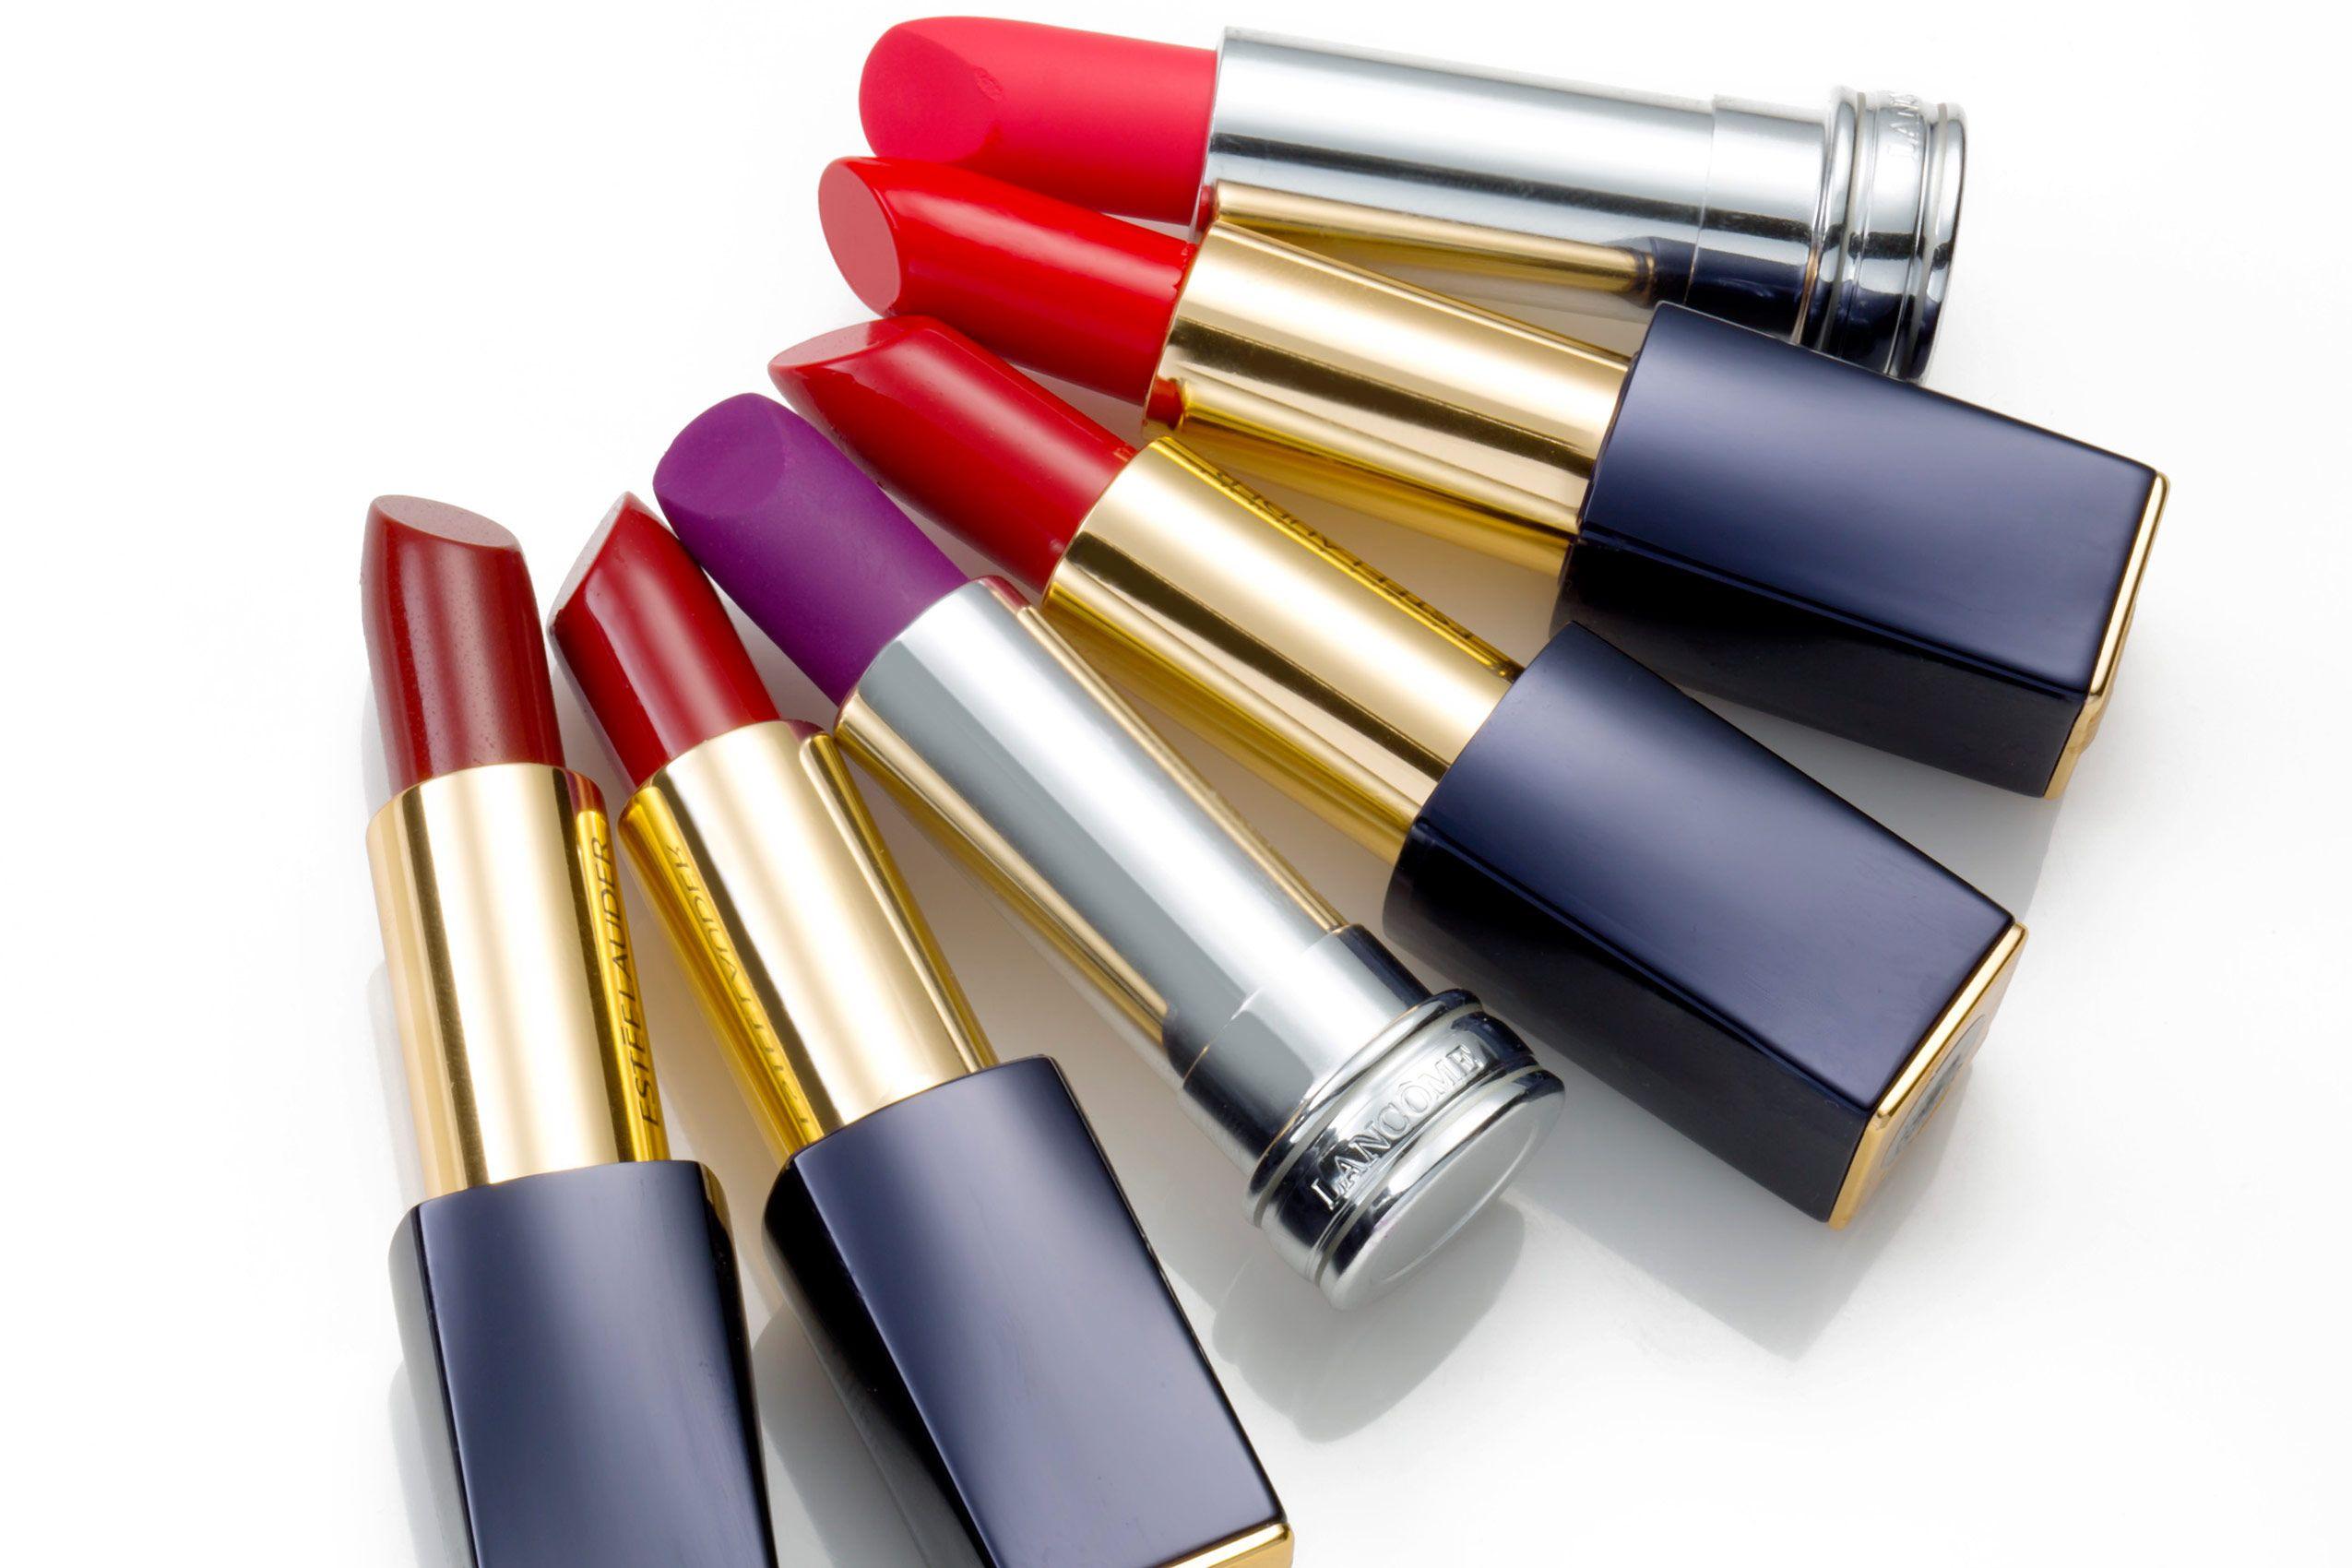 lipsticks.jpg